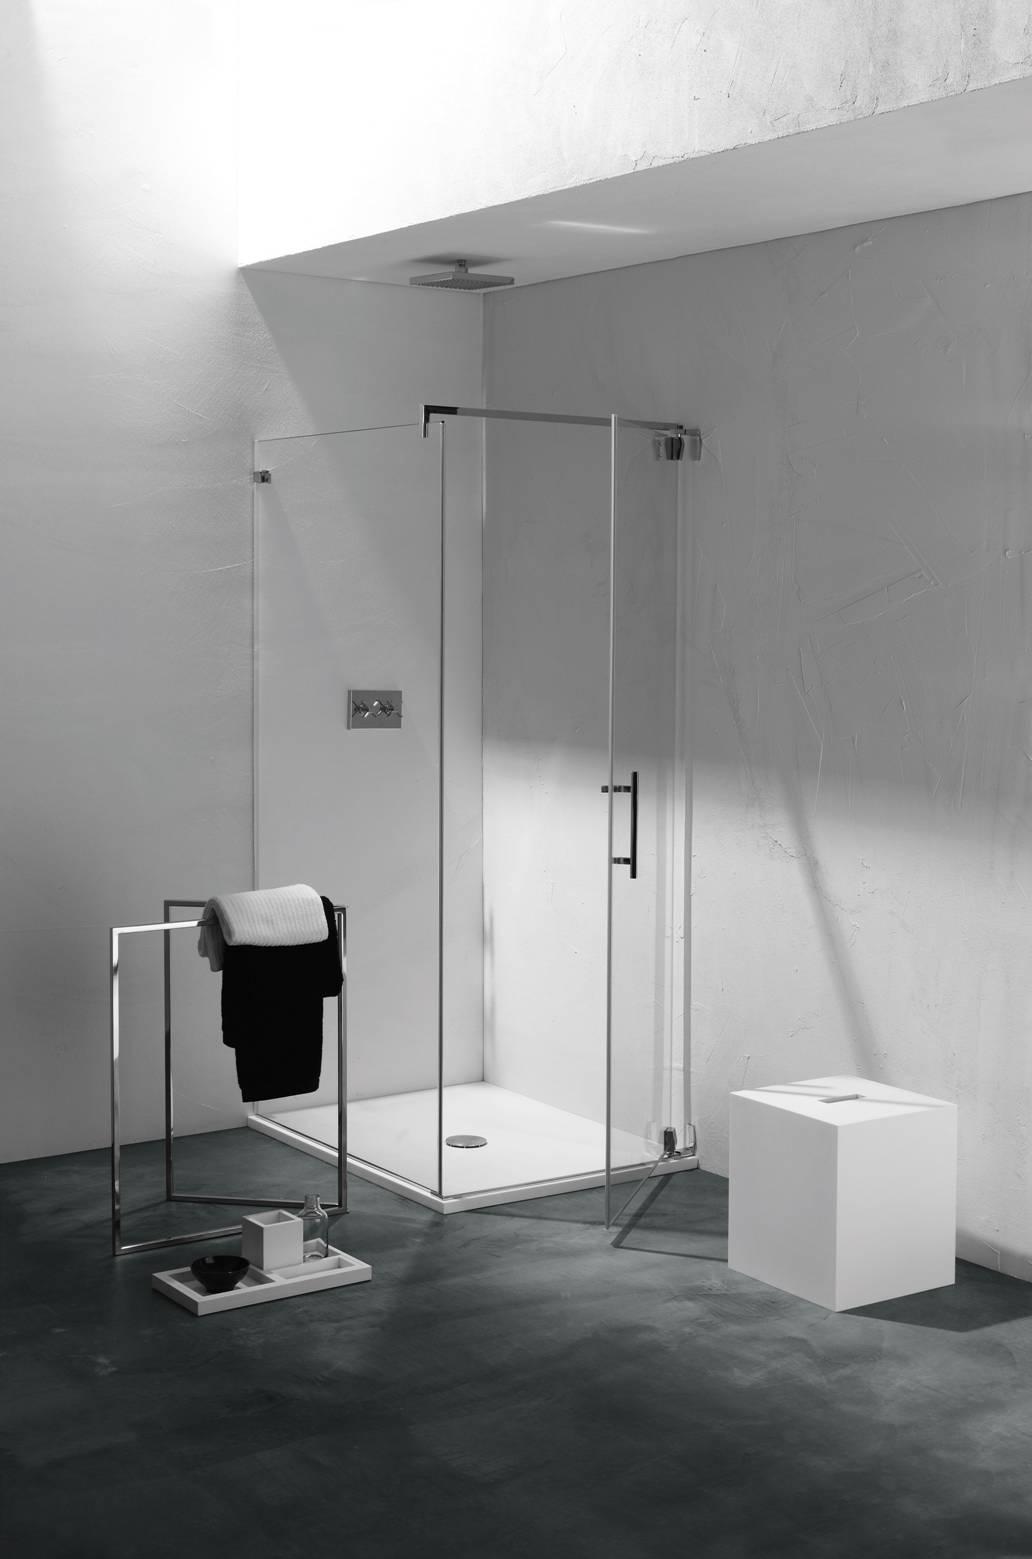 Just la cabina doccia senza profili arredobagno news - Doccia senza porta ...